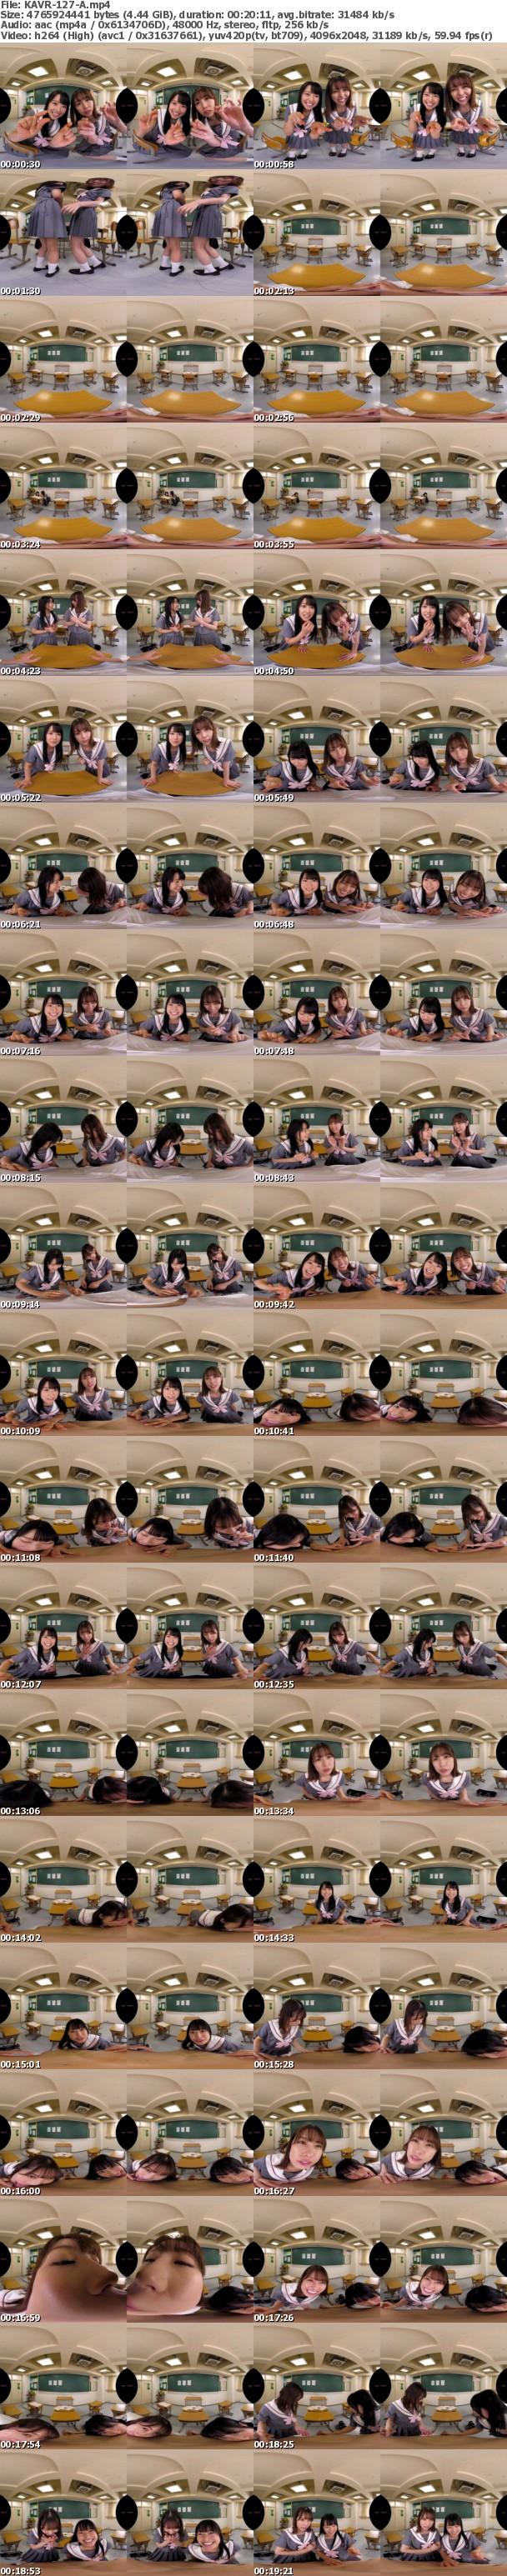 (VR) KAVR-127 乳首しか勝たん!乳首はズッ友!「先輩、いつも乳首触ってません?キモッ!」吹奏楽部の肺活量がエグいバキューム乳首吸引 ジュルジュル&ギュンギュン左右シンクロ乳頭責めWチクビッ痴